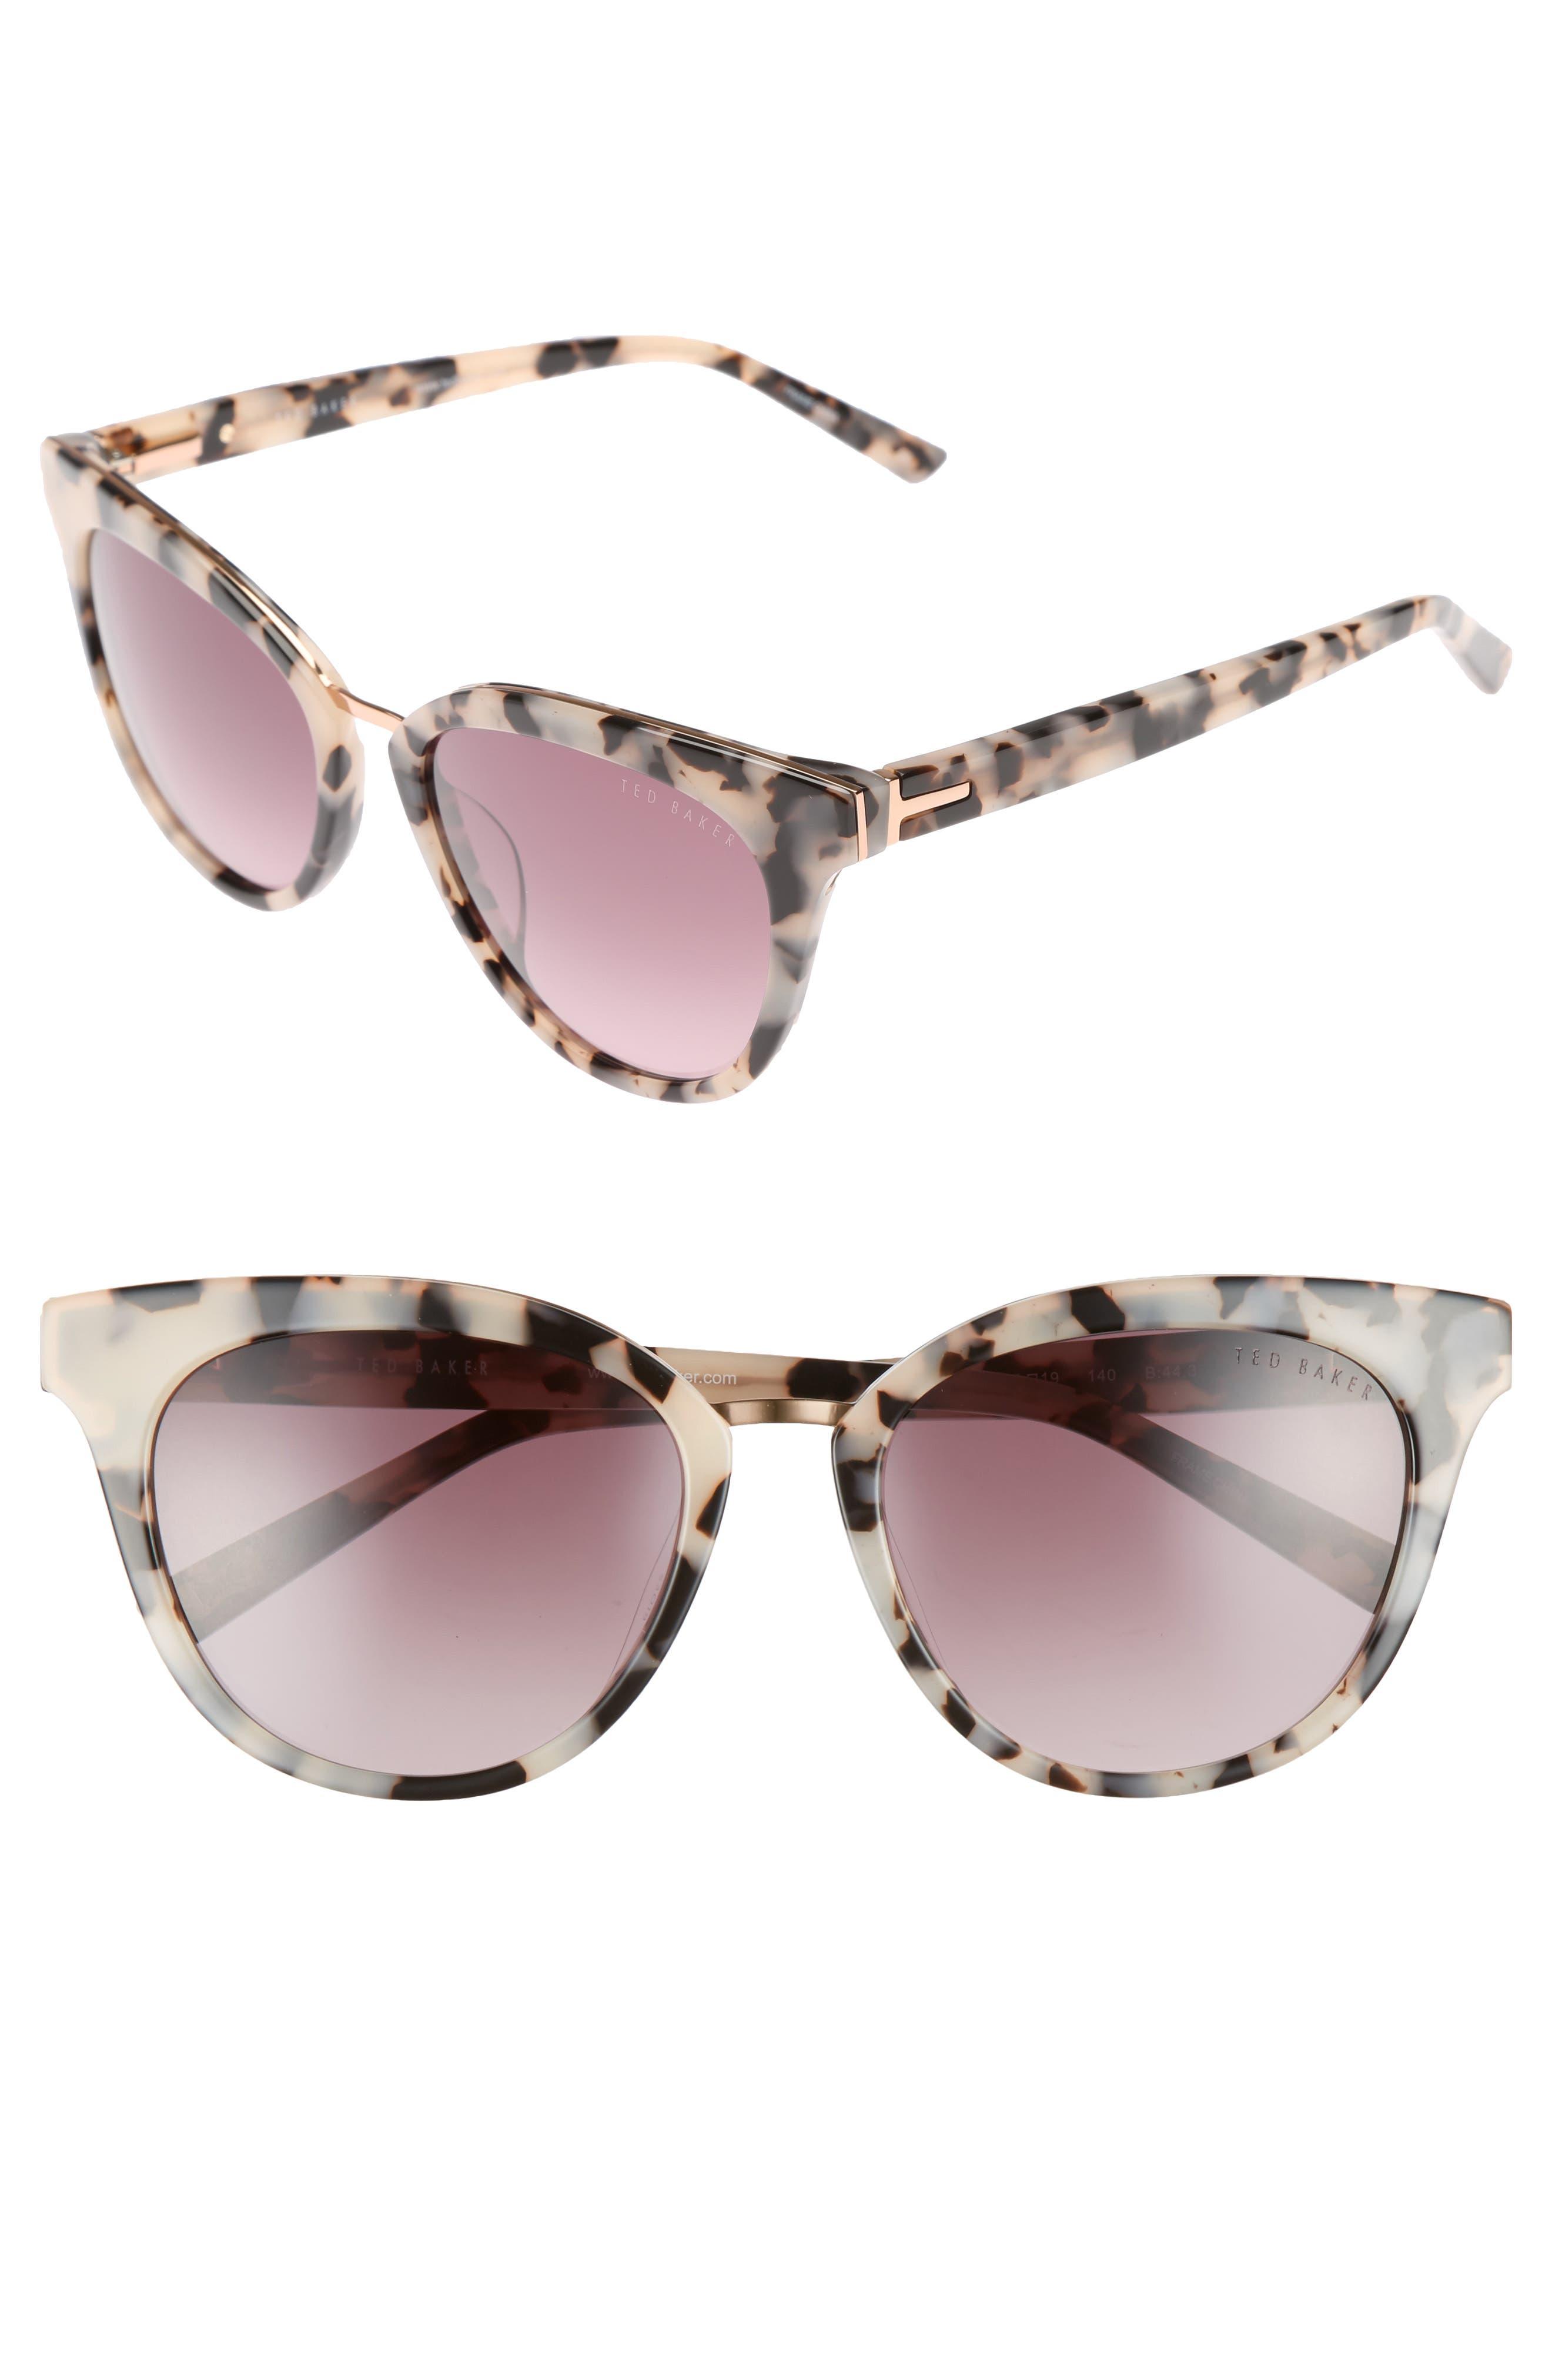 53mm Cat Eye Sunglasses,                         Main,                         color, IVORY